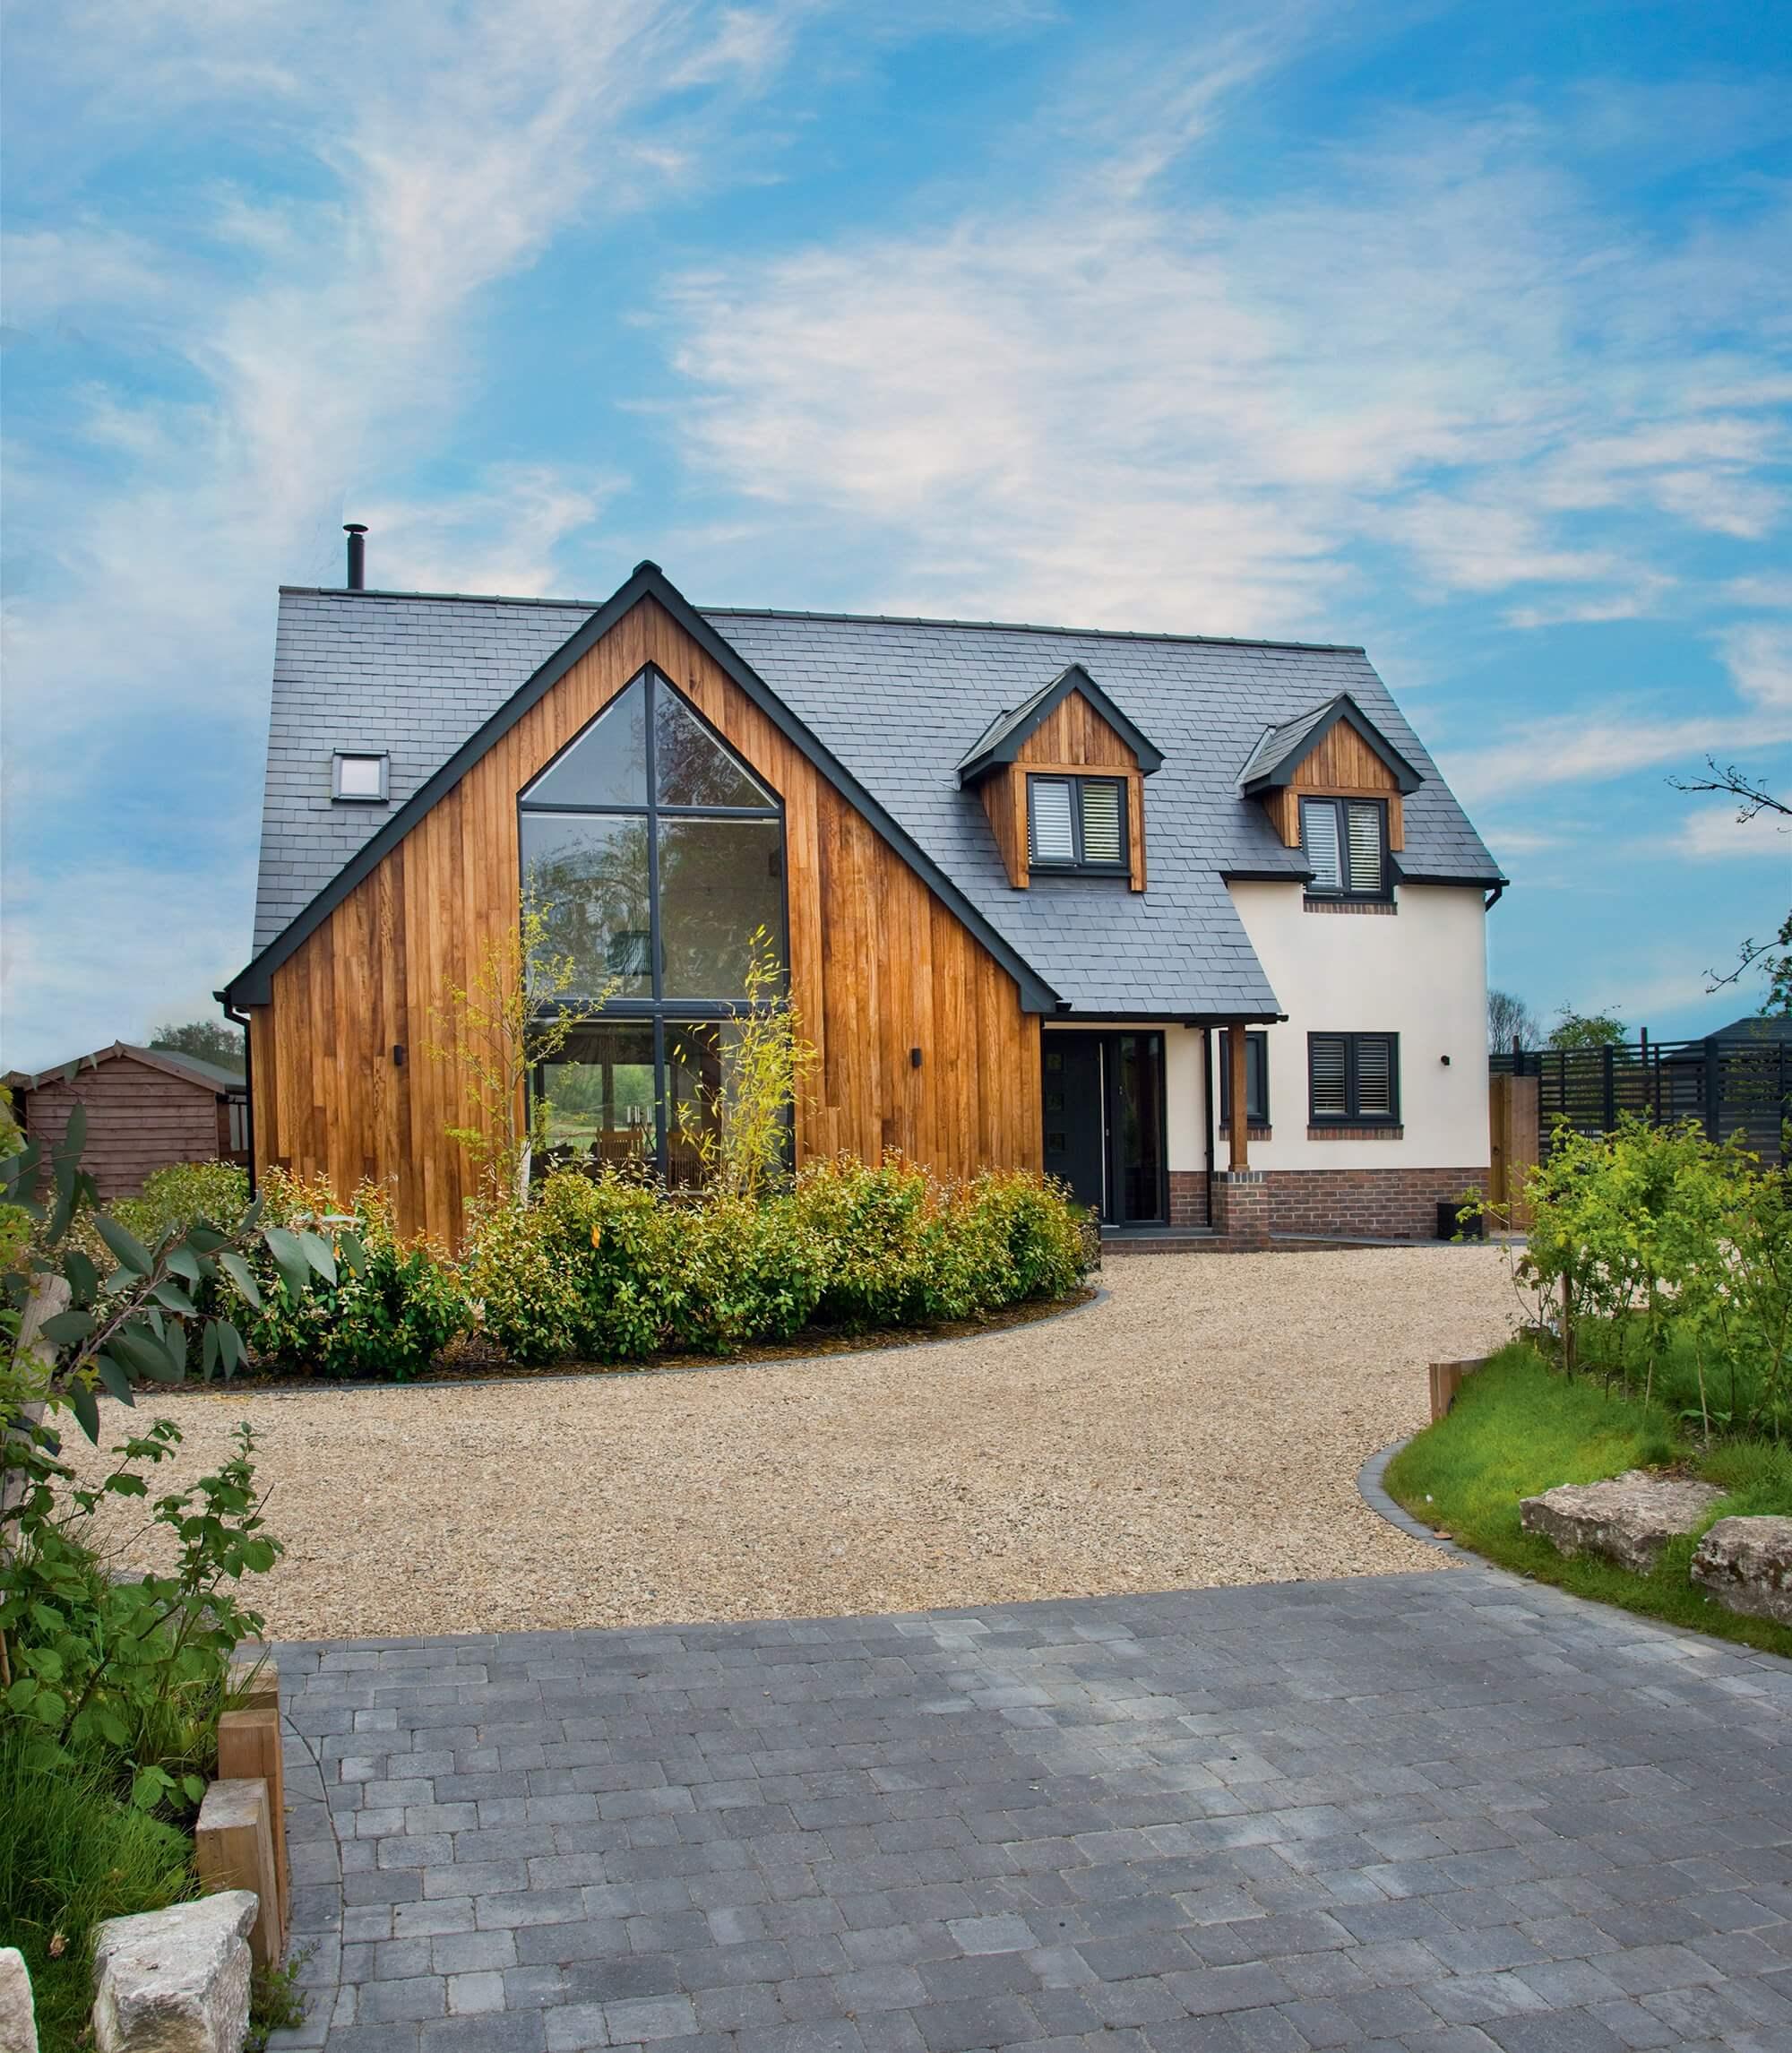 Modern timber frame home with iroko cladding